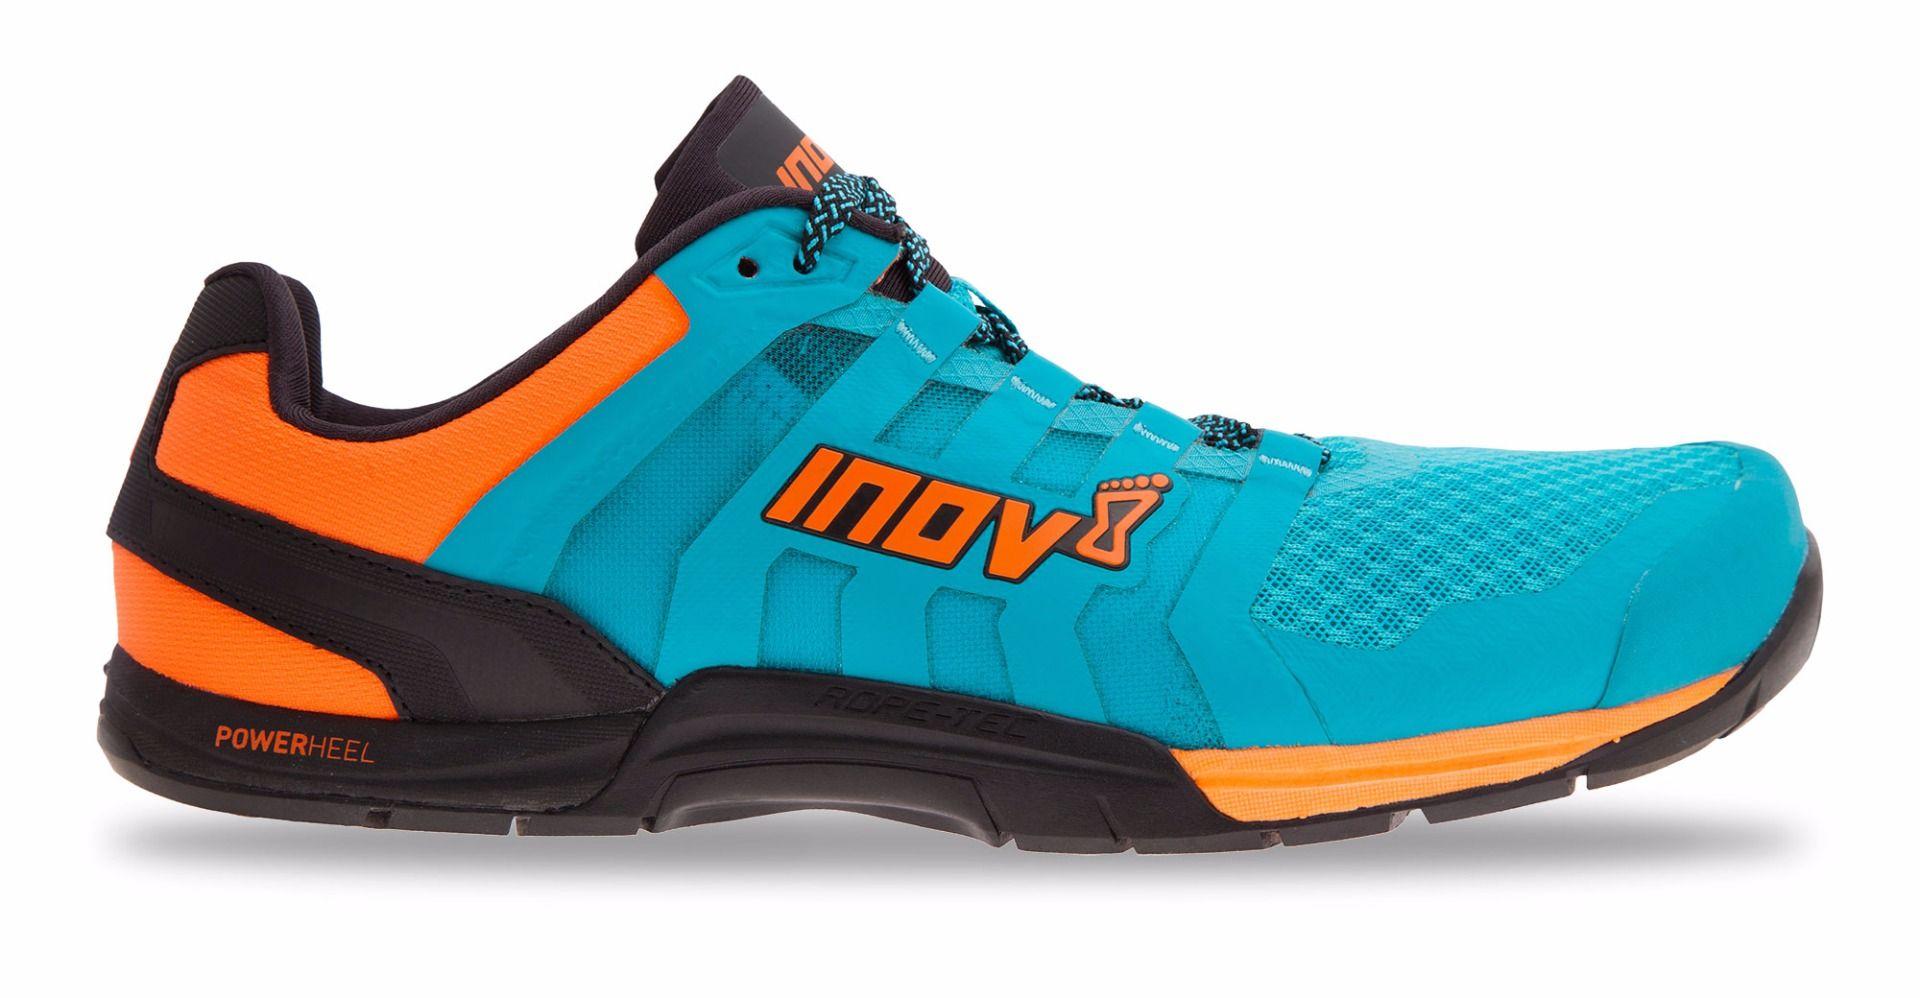 Inov-8 F-Lite 235 Fitness schoenen Heren - Blauw / Neon Oranje / Zwart thumbnail